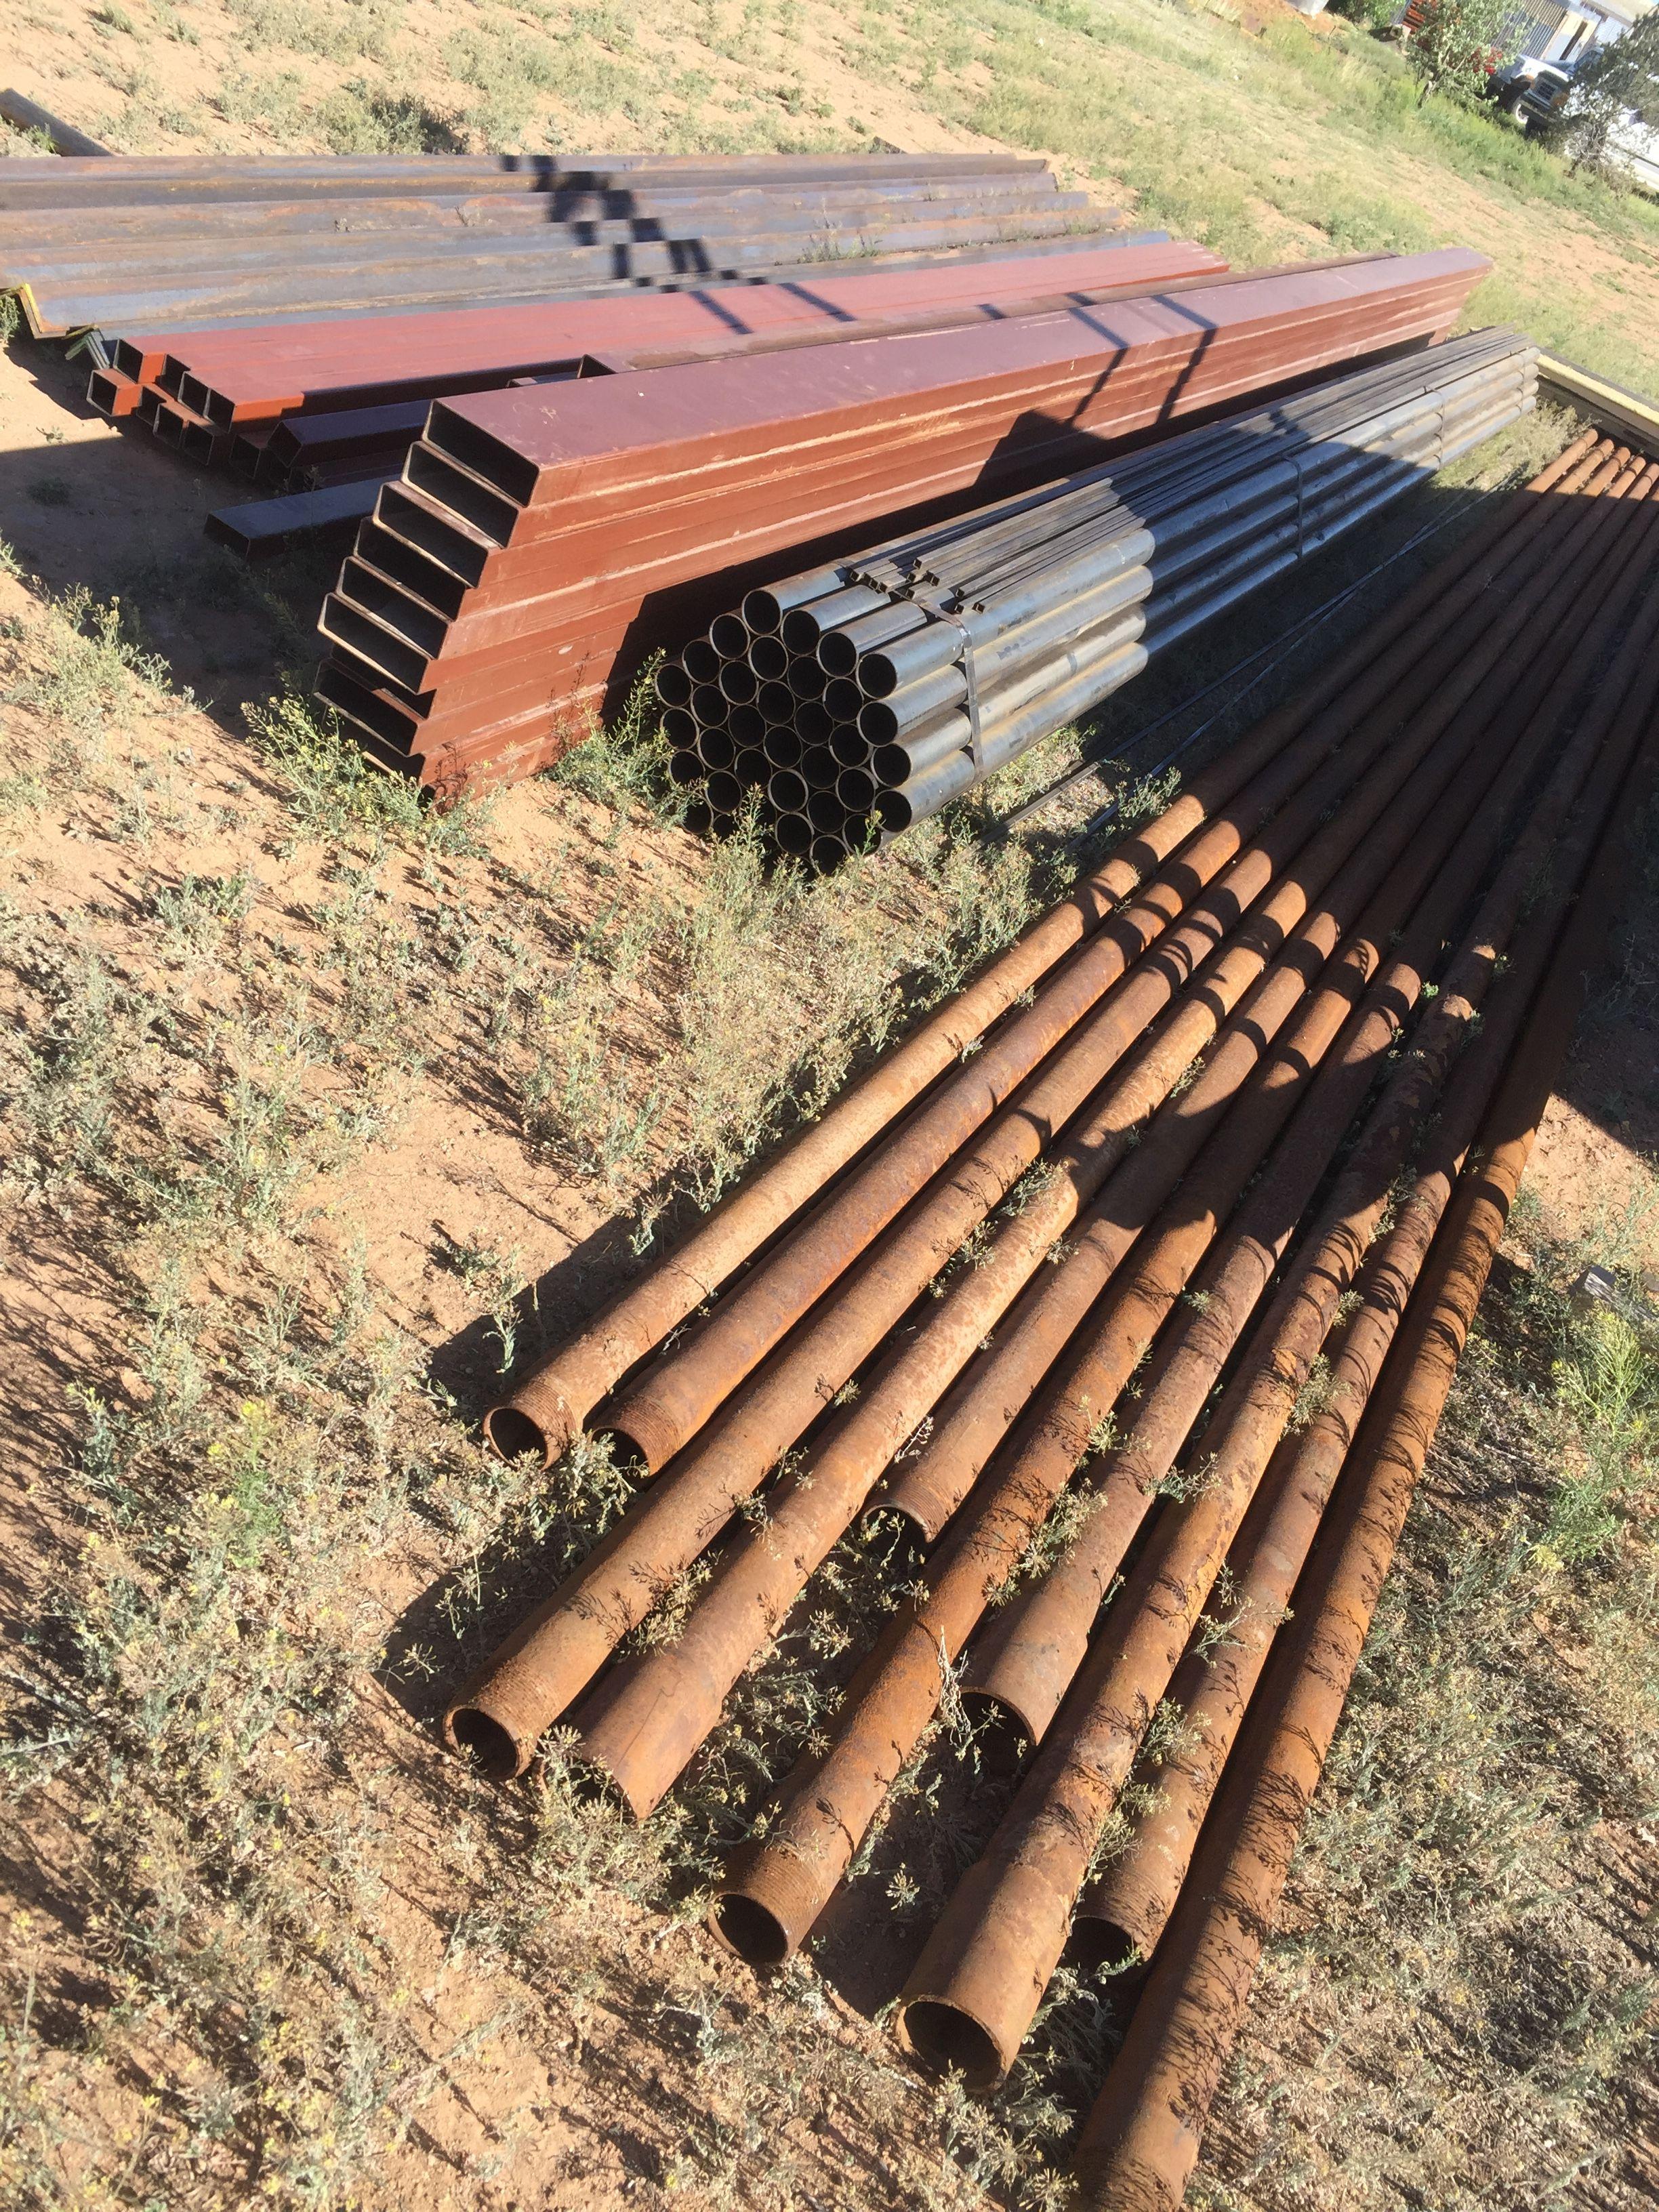 Pin On Cactus Ranch 62 Cedar Road Santa Fe New Mexico 87508 Mark Vercruysse